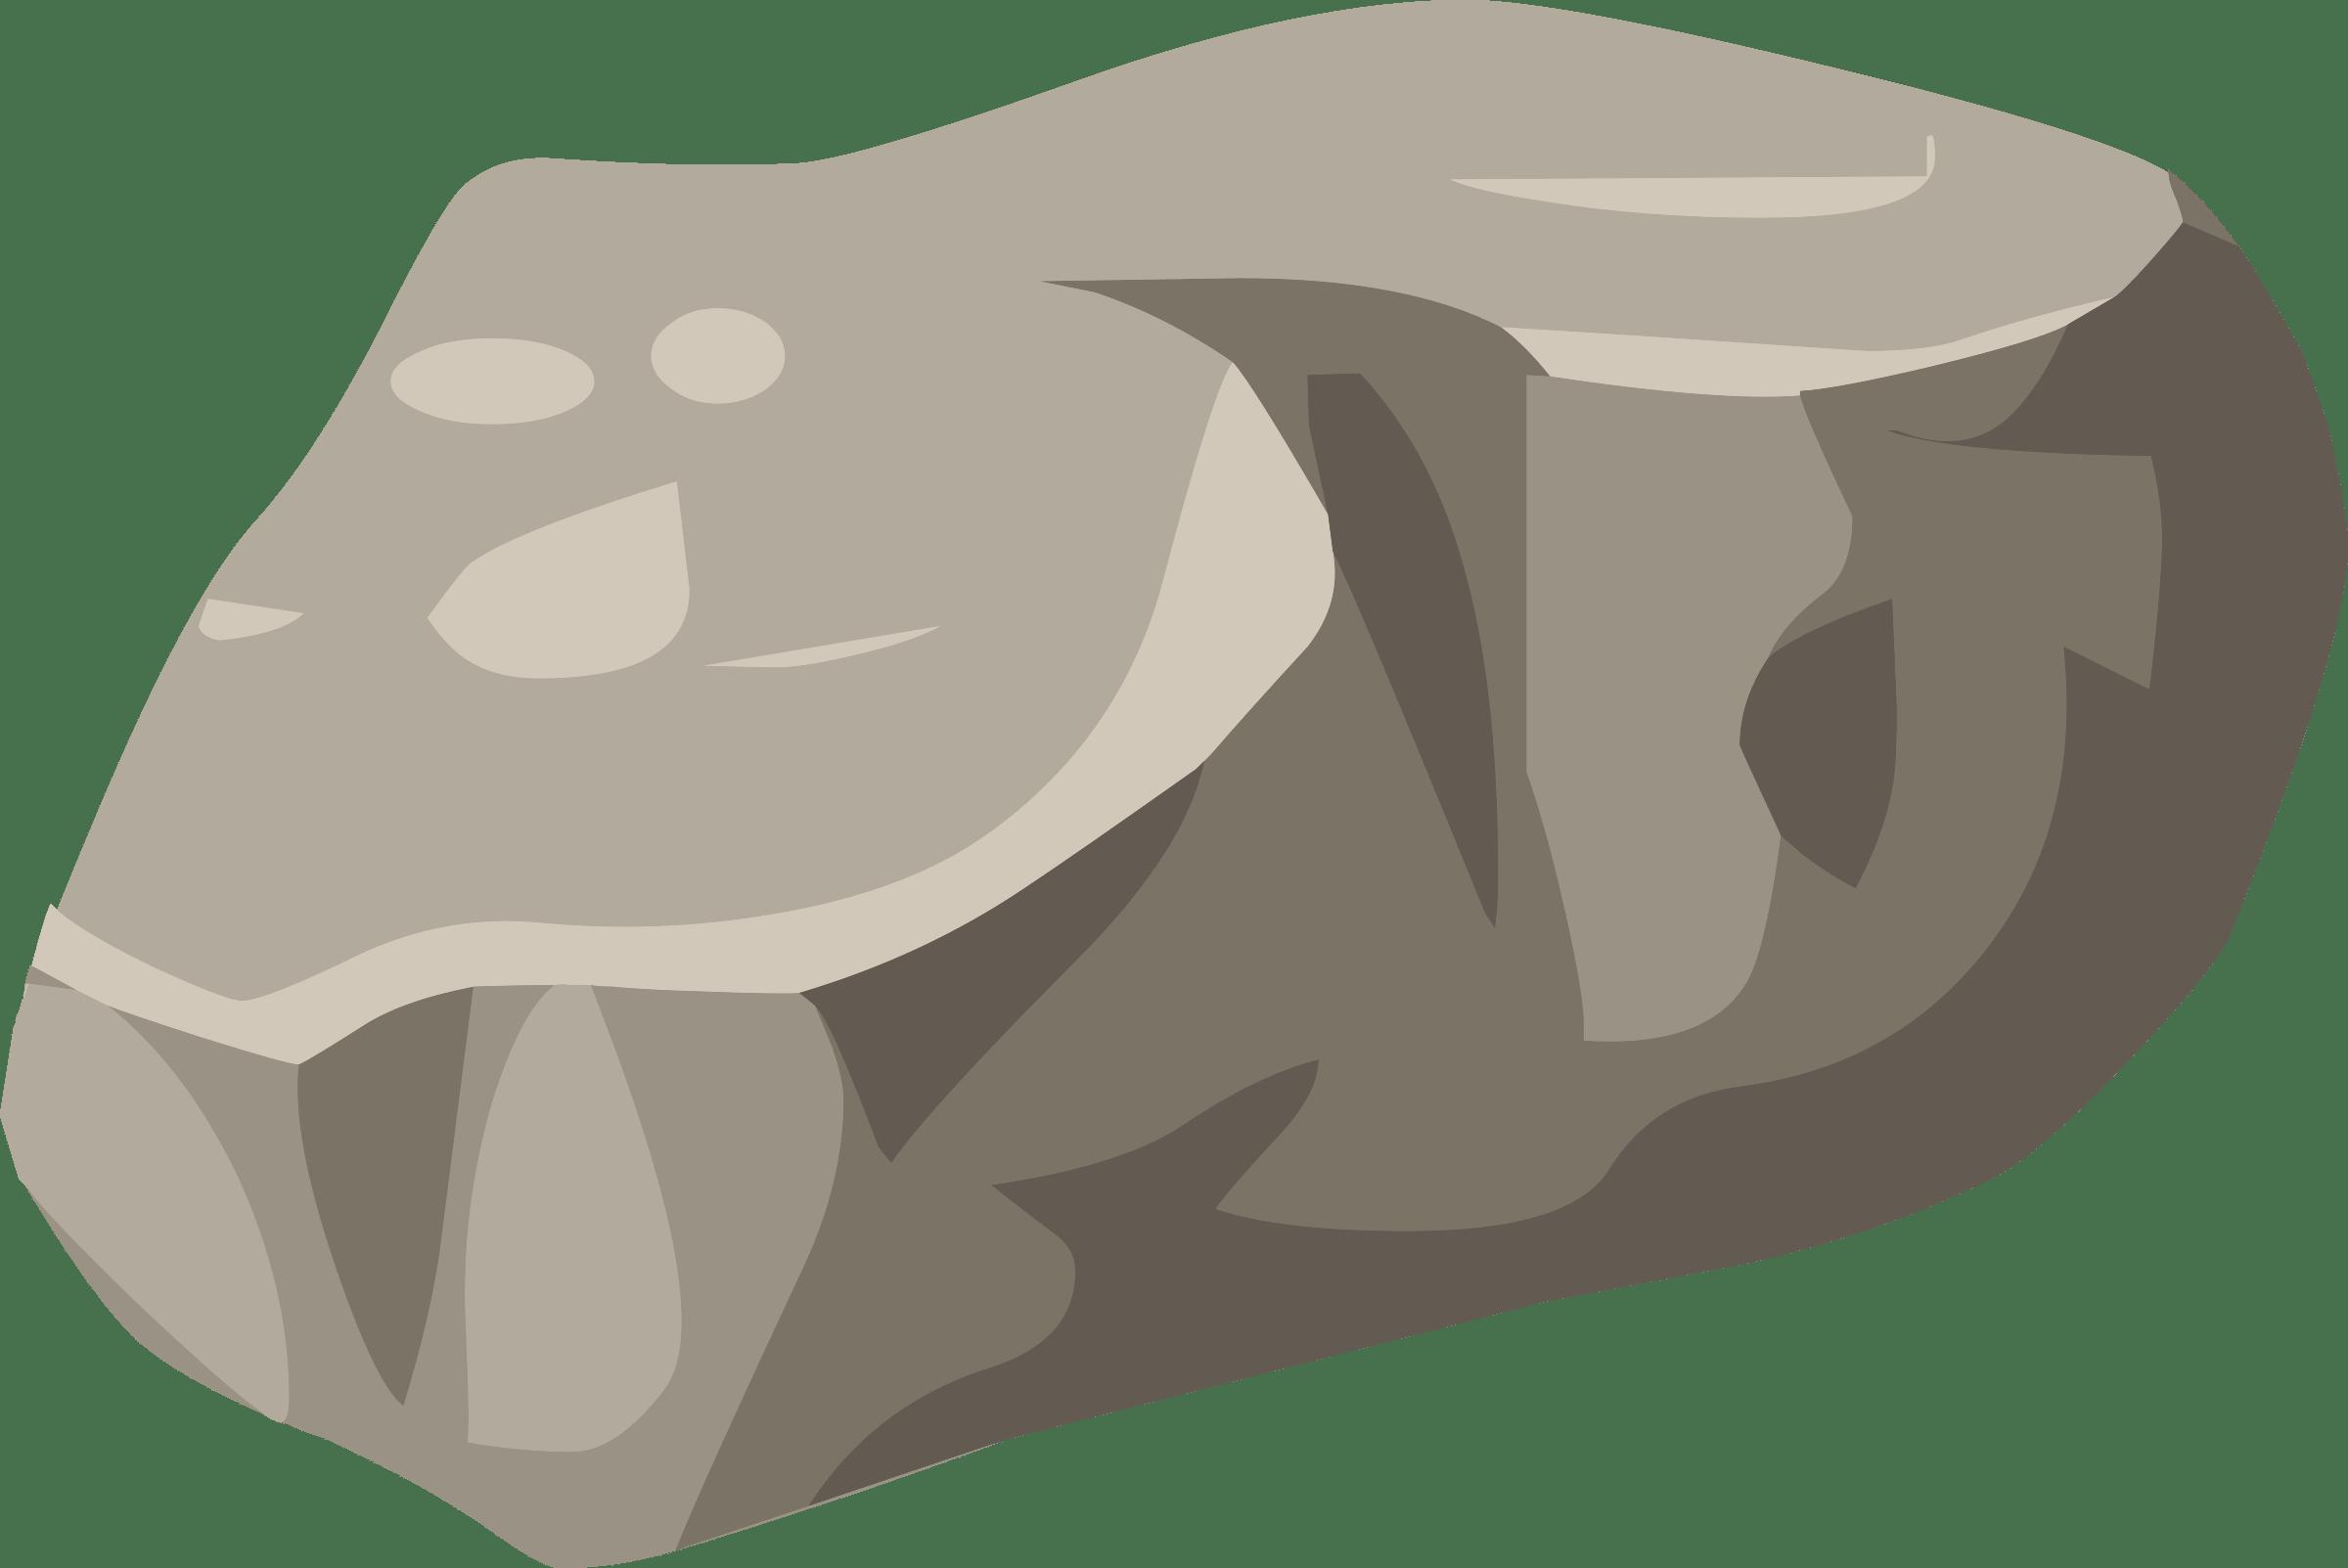 Sedimentary rock clipart image freeuse stock Clipart rock sedimentary rock, Clipart rock sedimentary rock ... image freeuse stock